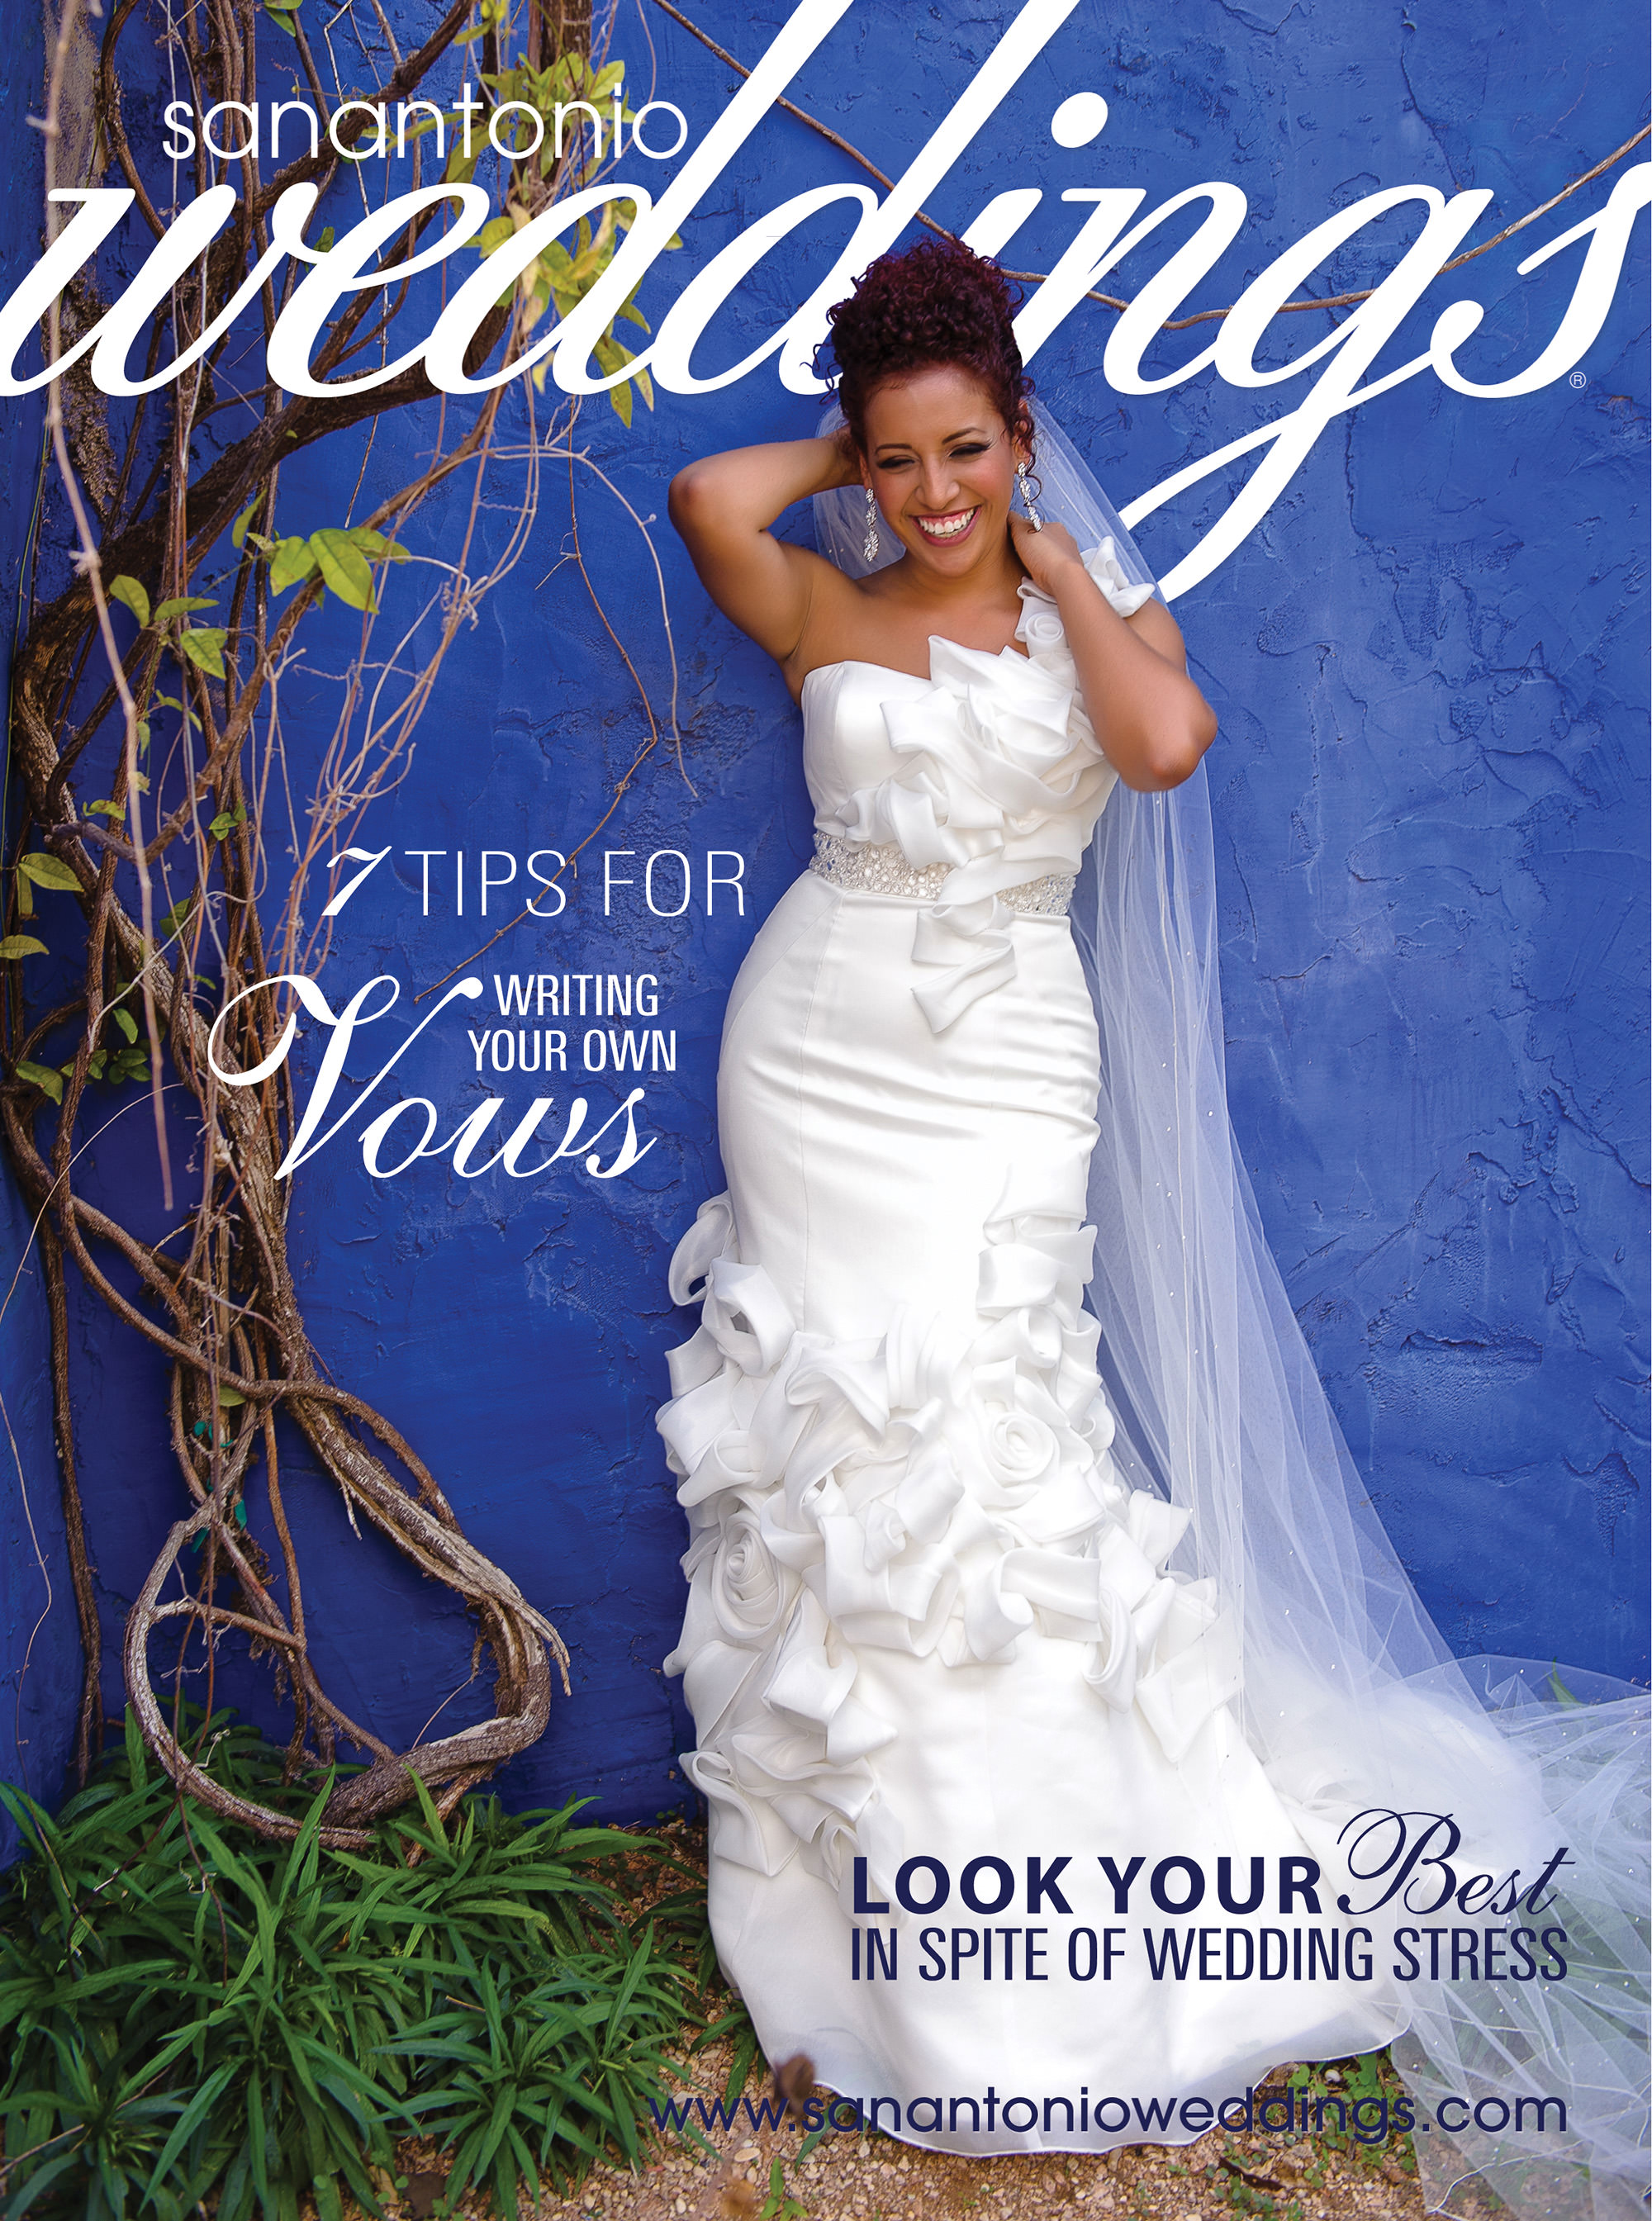 San Antonio Weddings Magazine Cover  (2013, Vilma Rodriguez-Dyer)